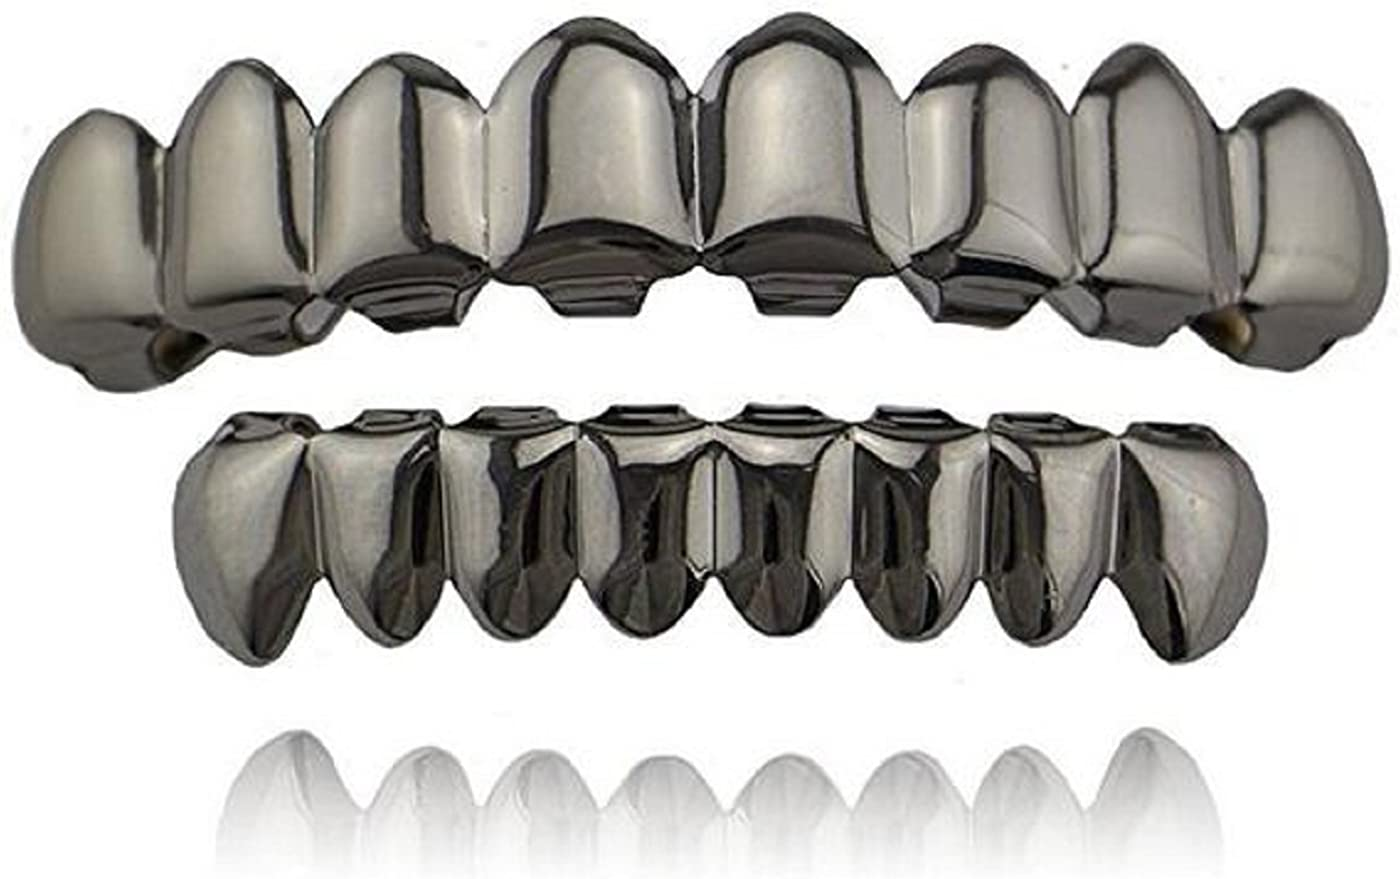 mainlead Universal Black Shiny Hip Hop Teeth Grills 8 Top and 8 Bottom Grills Set (Gun Hematite)